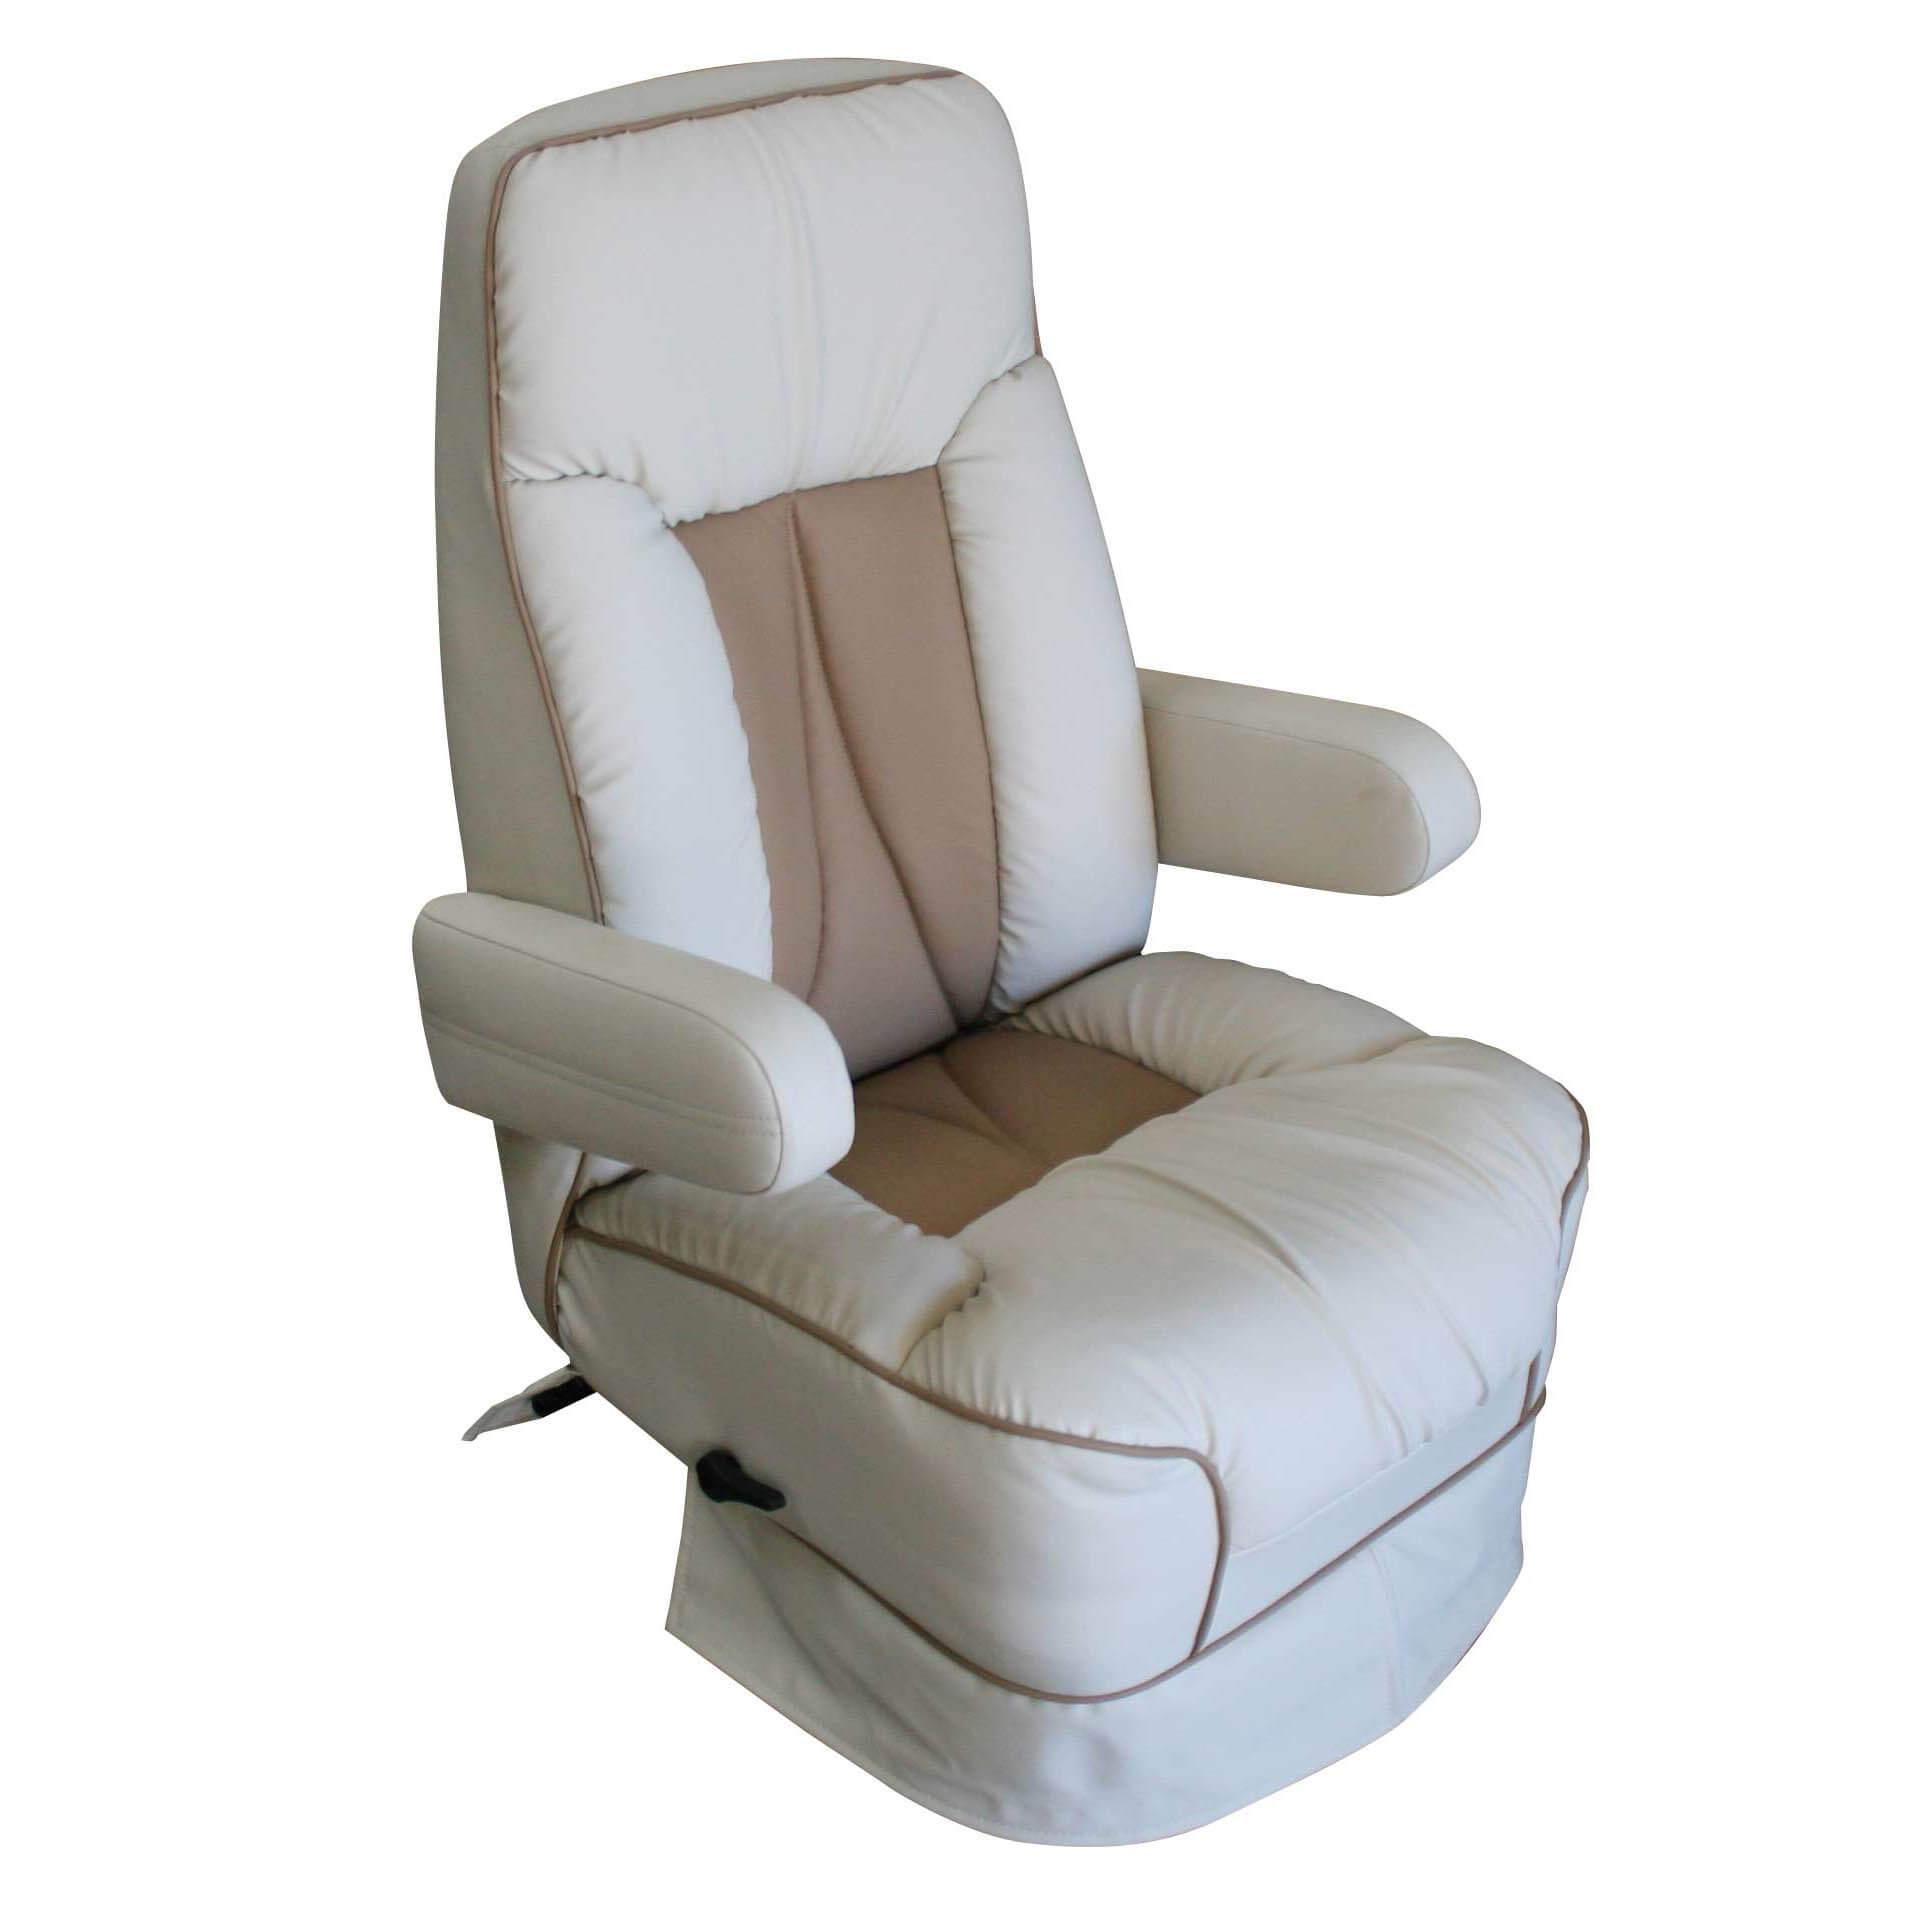 Qualitex Ambassador Rv Furniture Package Rv Seating